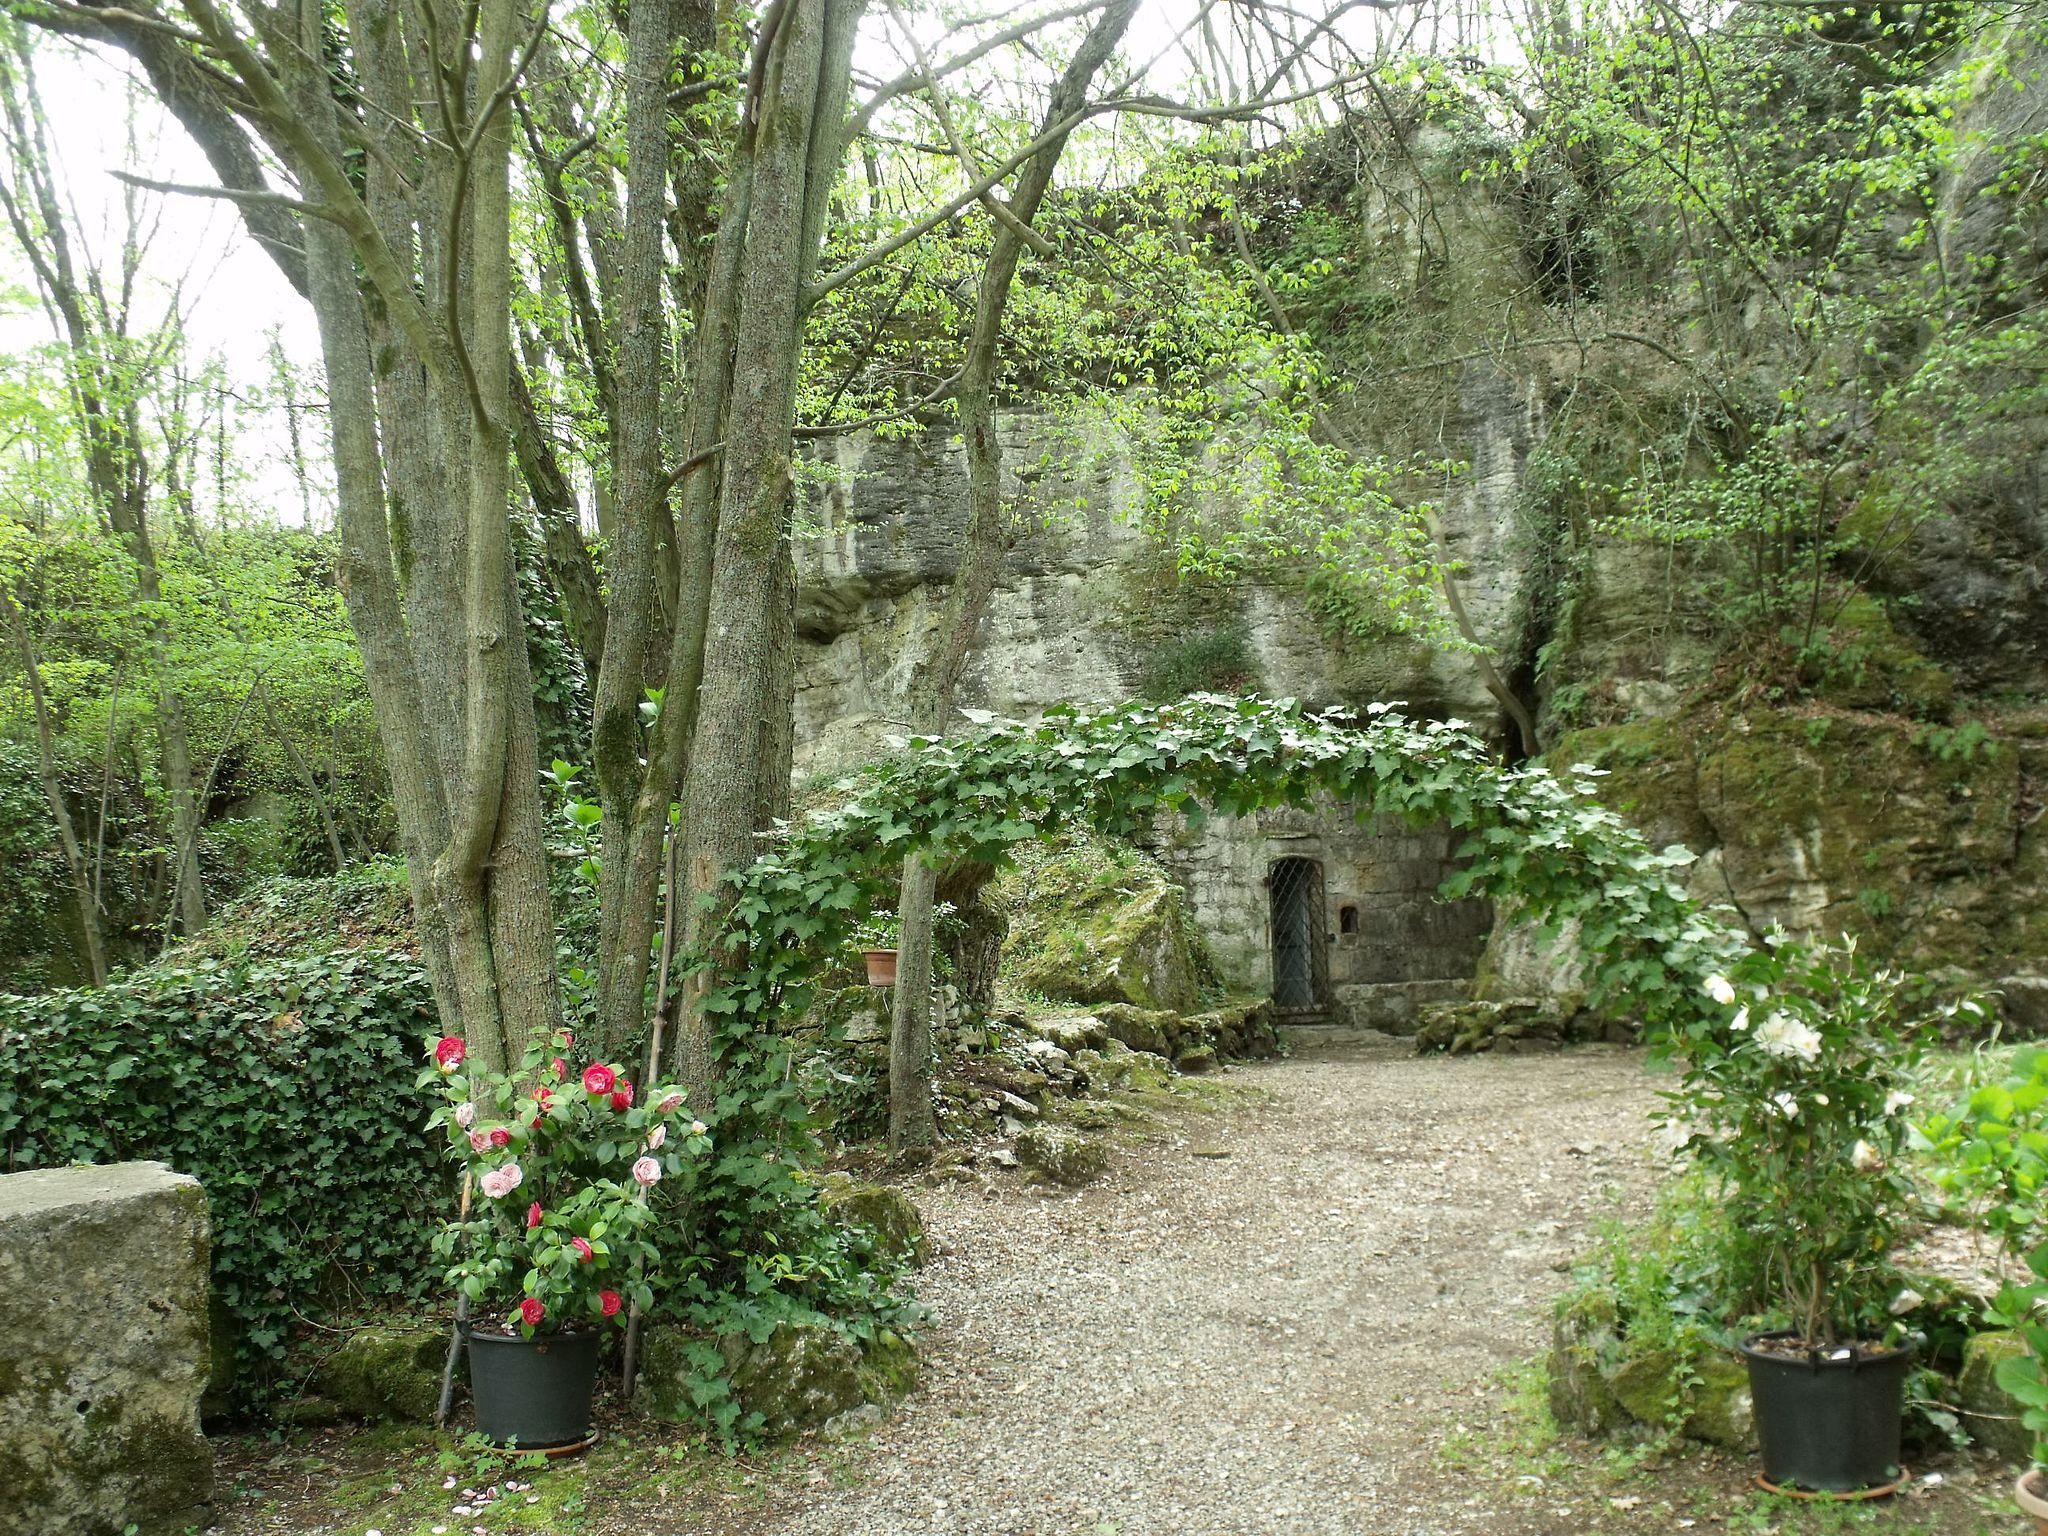 Grotta di San Filippo in Bagni San Filippo